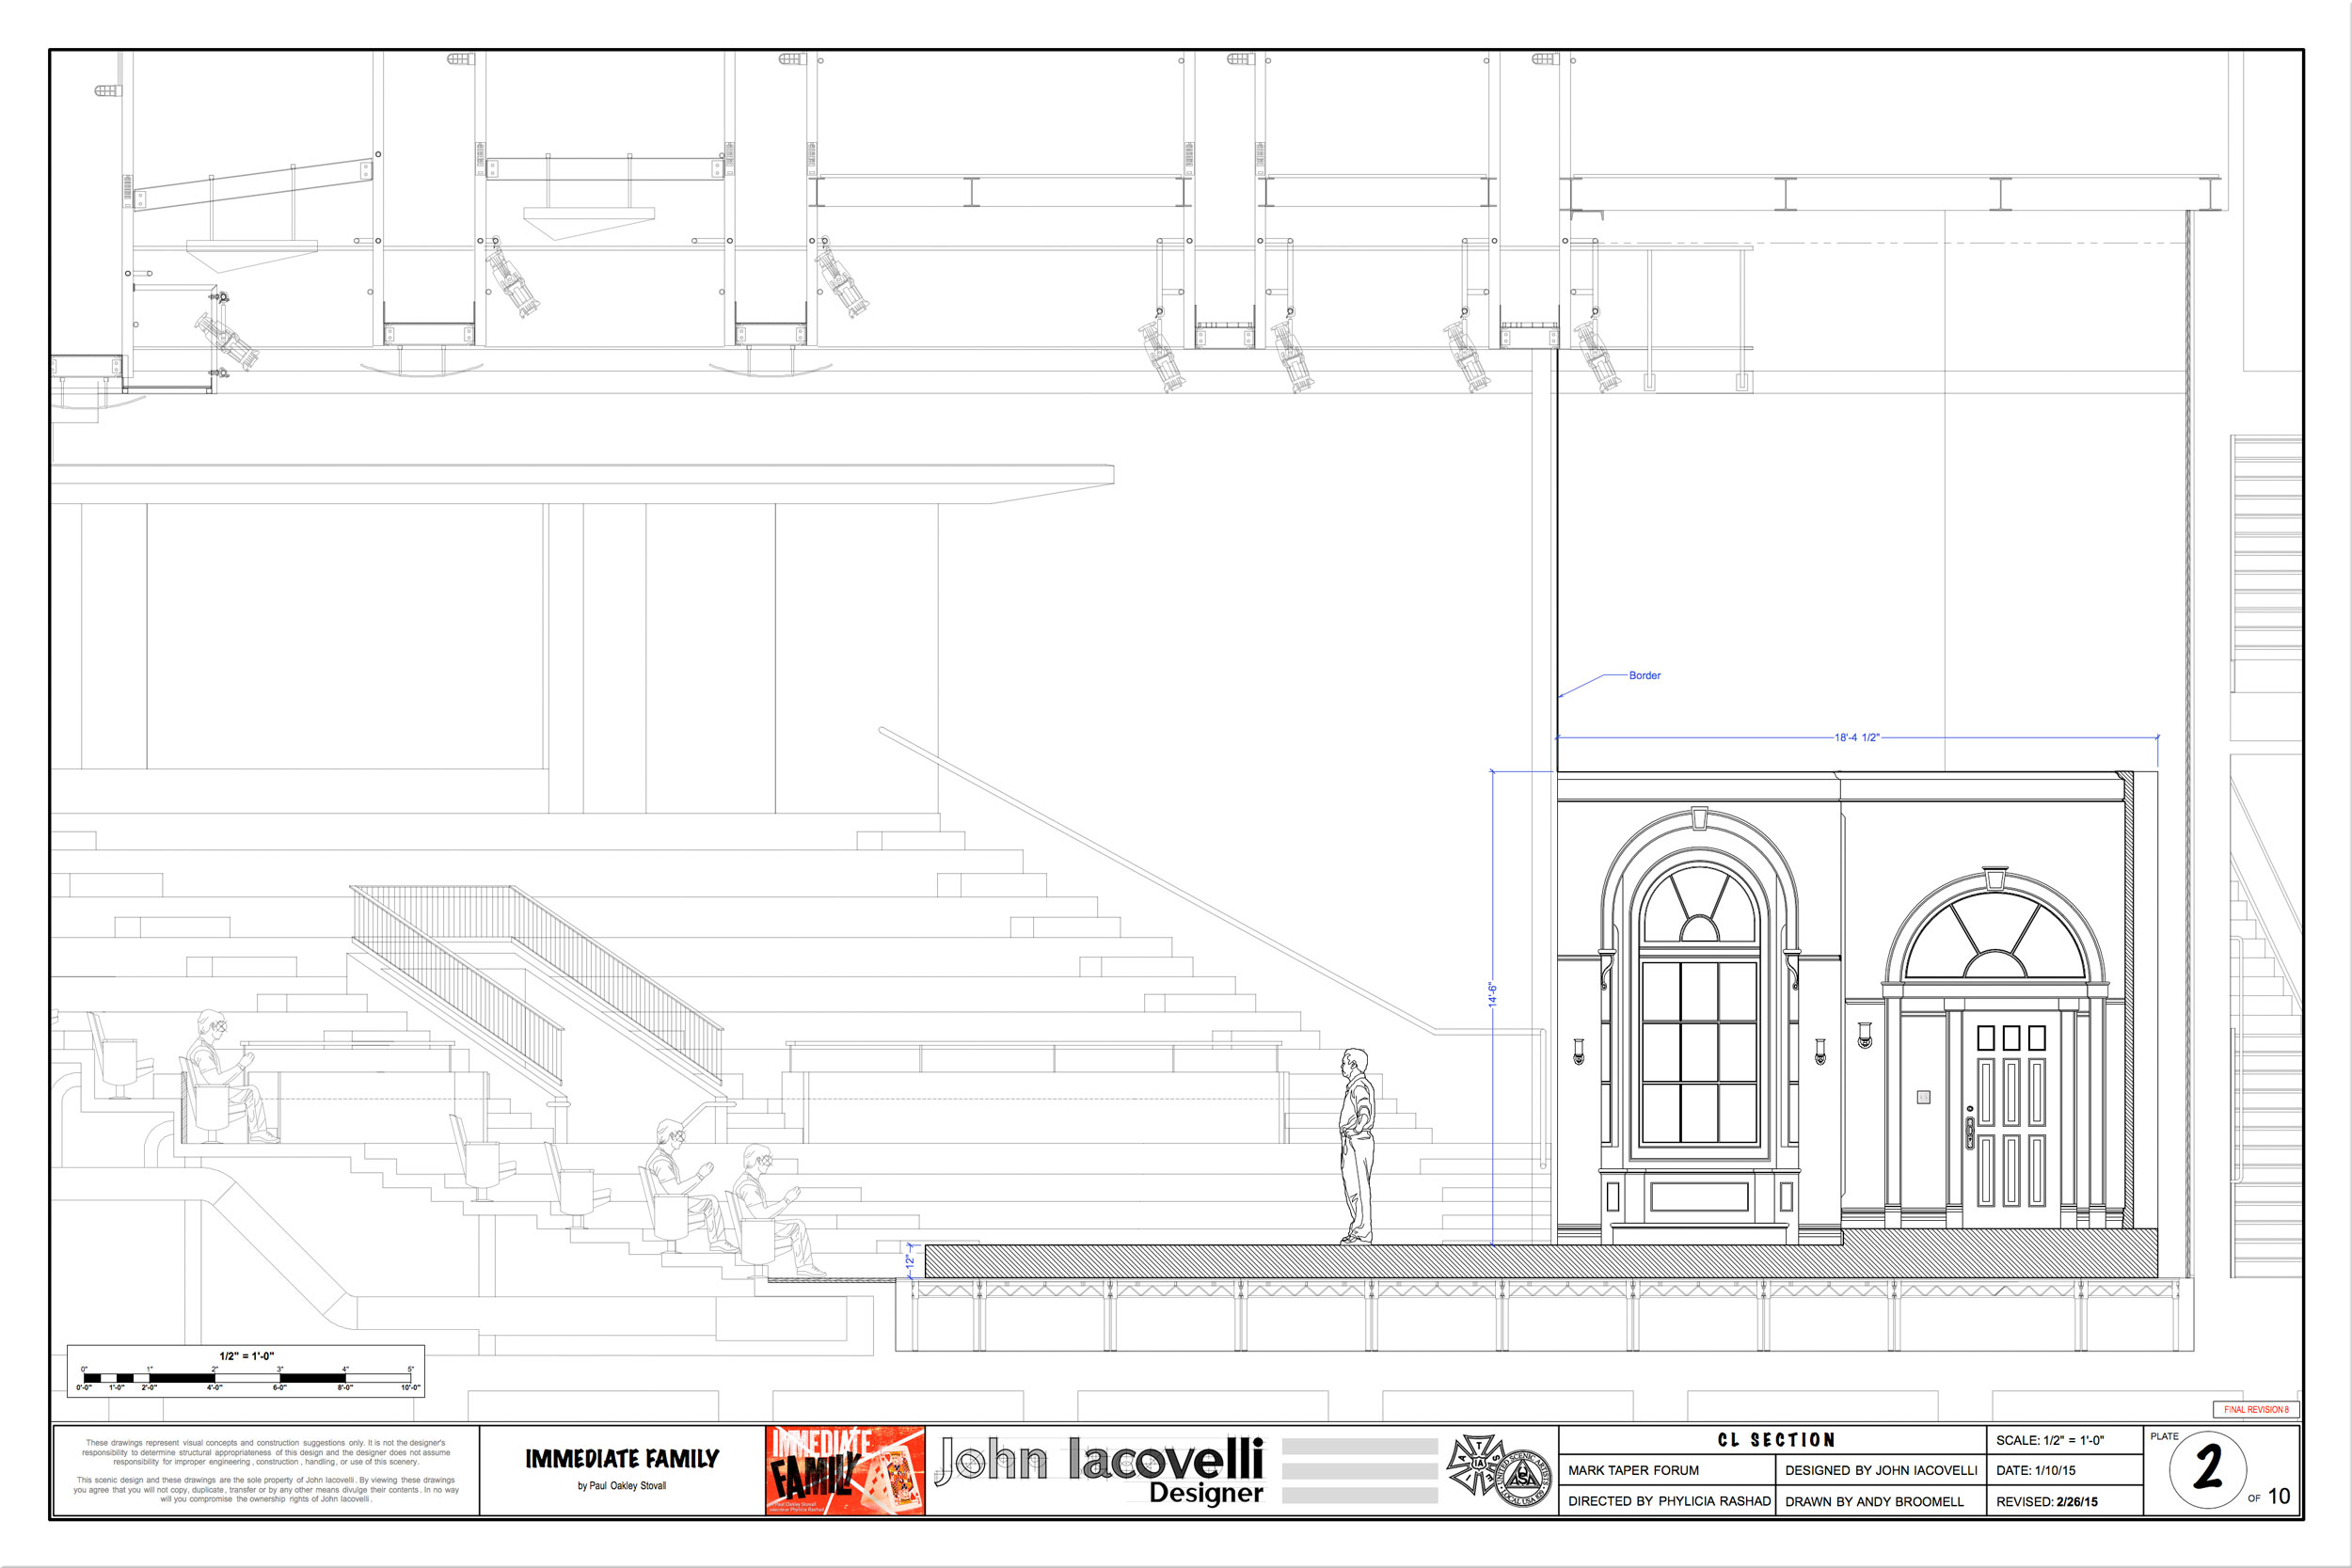 andy-broomell-scenic-design-drafting-immediate-family-2-vectorworks.jpg